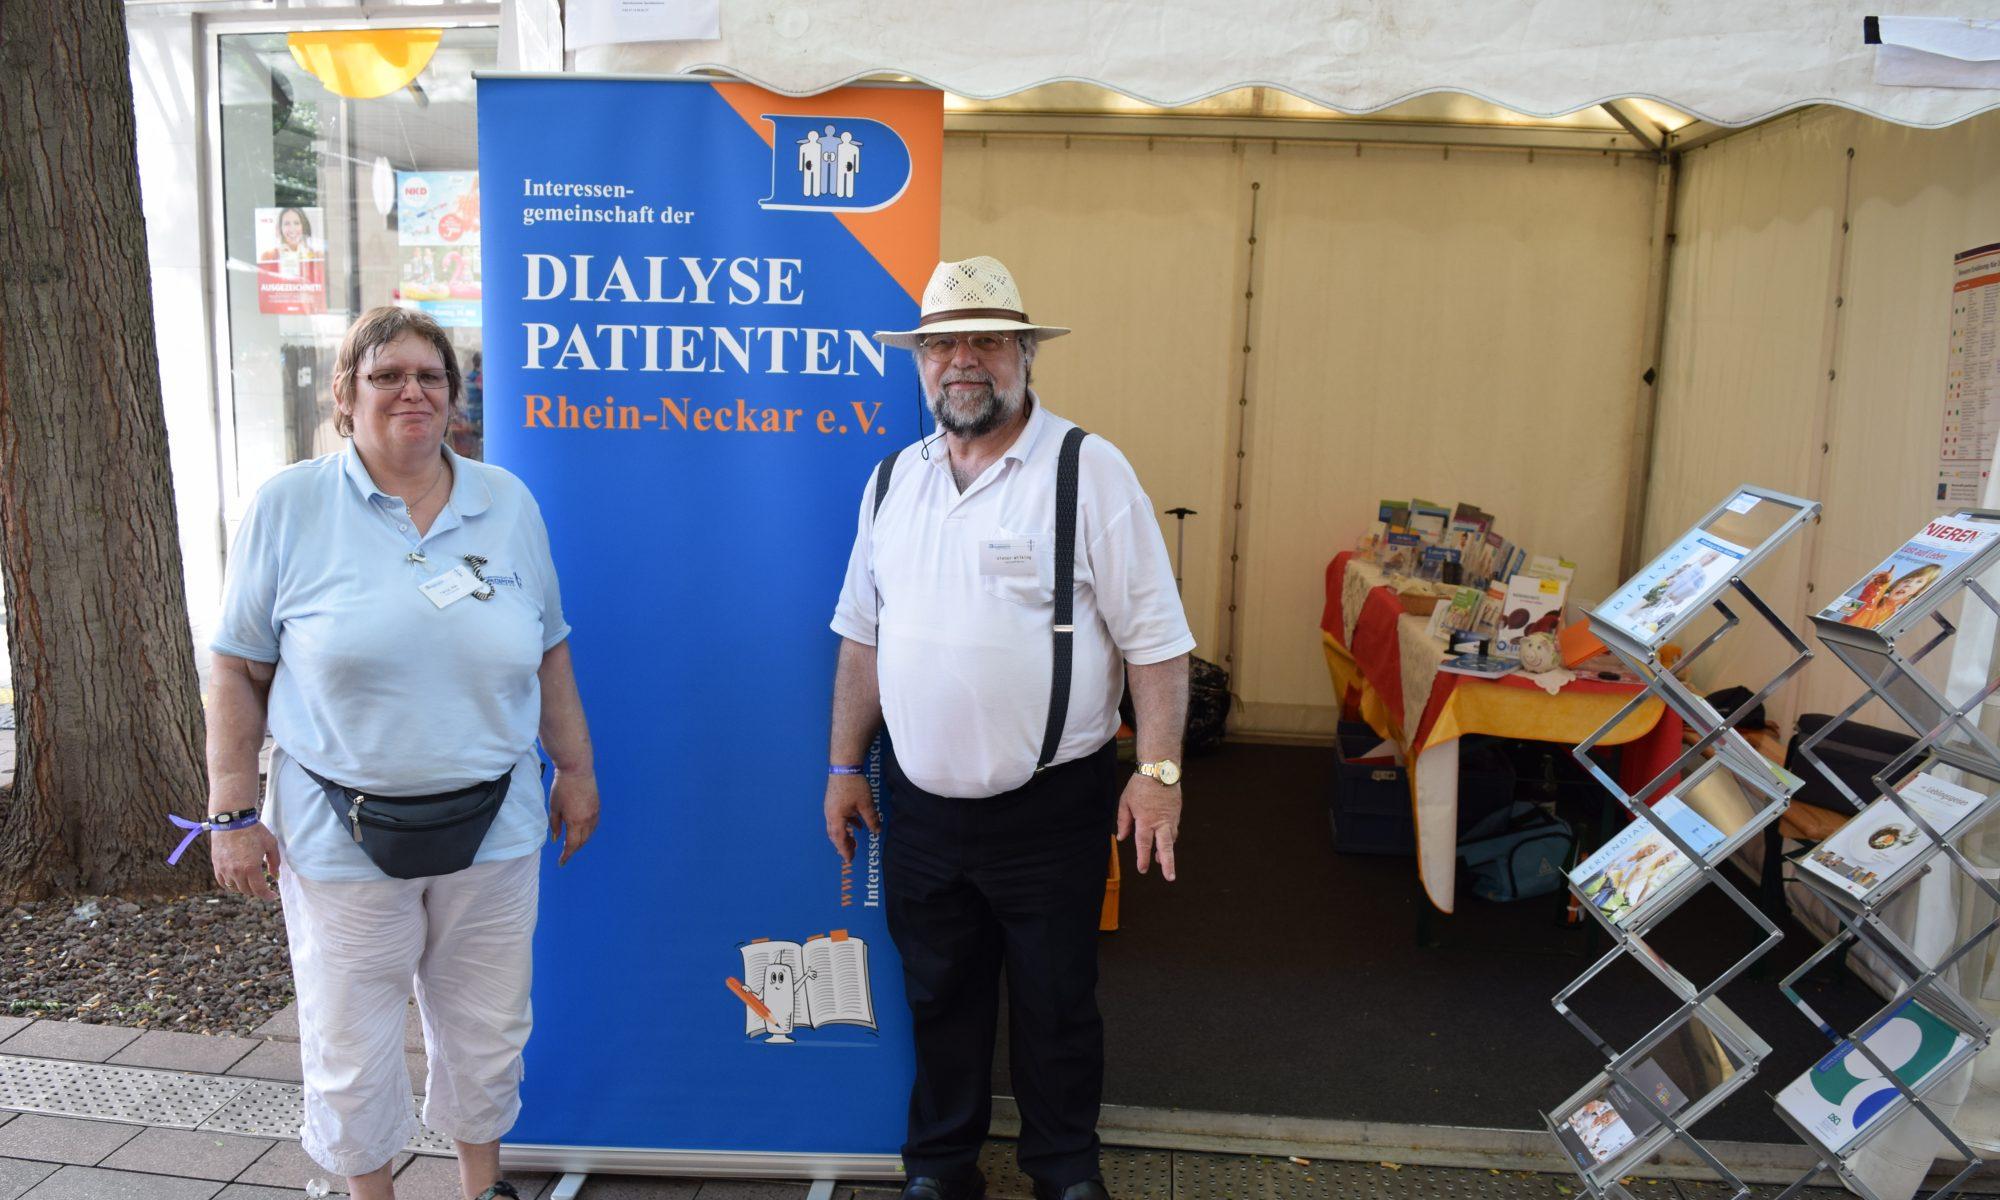 Interessengemeinschaft der Dialysepatienten Rhein-Neckar e.V.